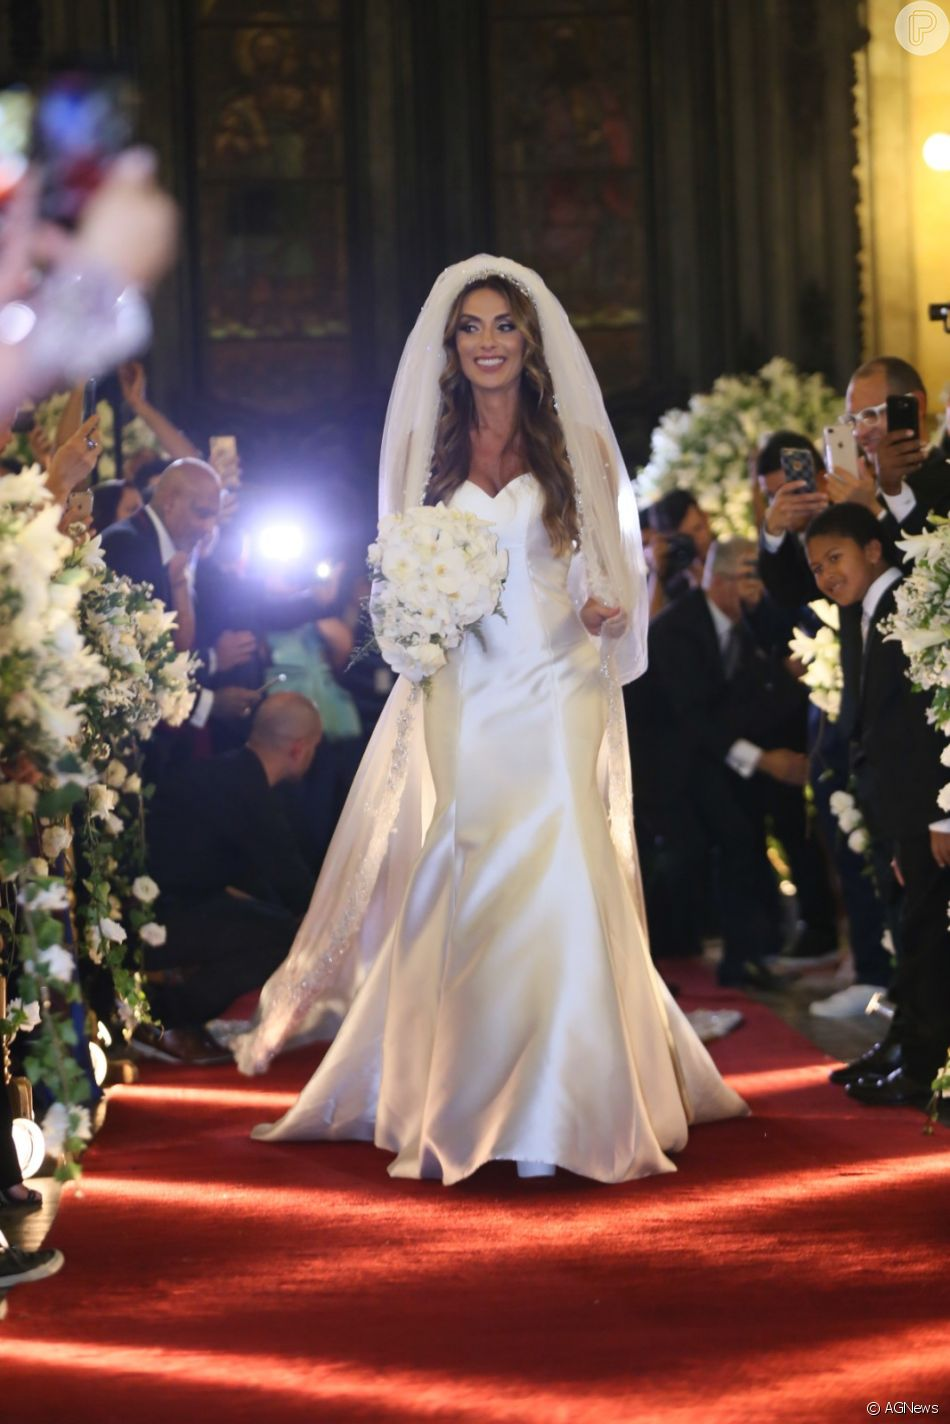 84dee9bc0e Nicole Bahls usa vestido de seda italiana ao se casar com Marcelo Bimbi  nesta terça-